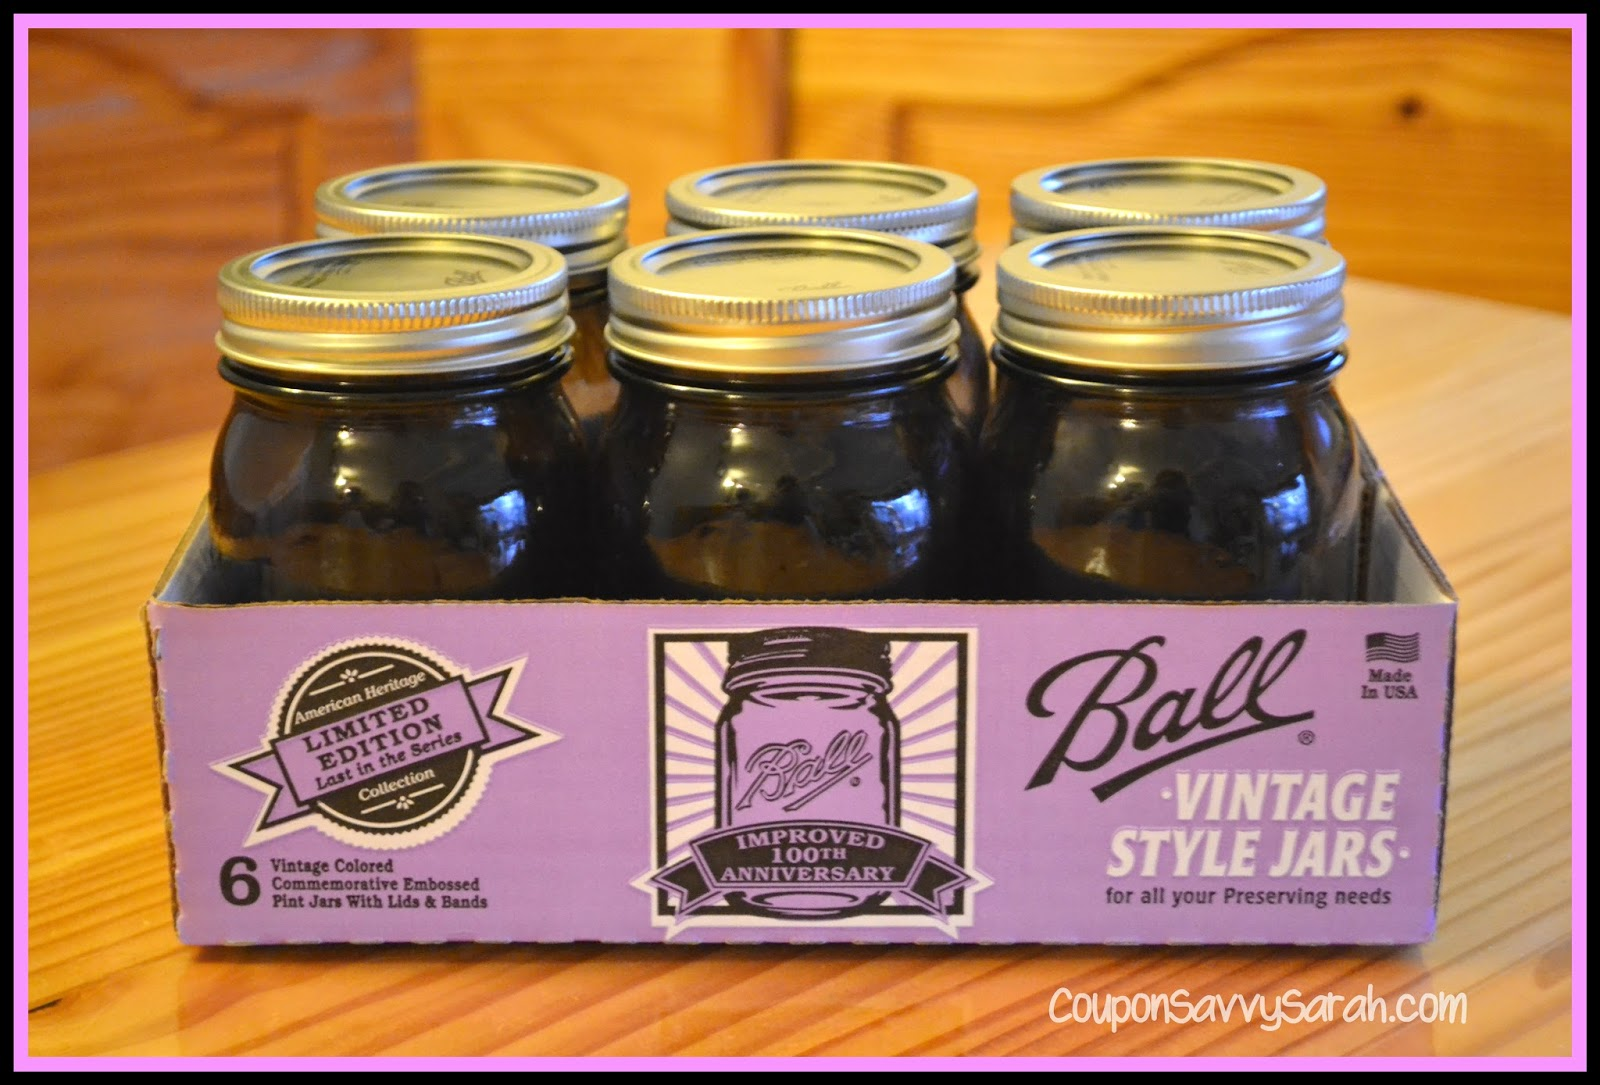 Ball canning jars coupon 2018